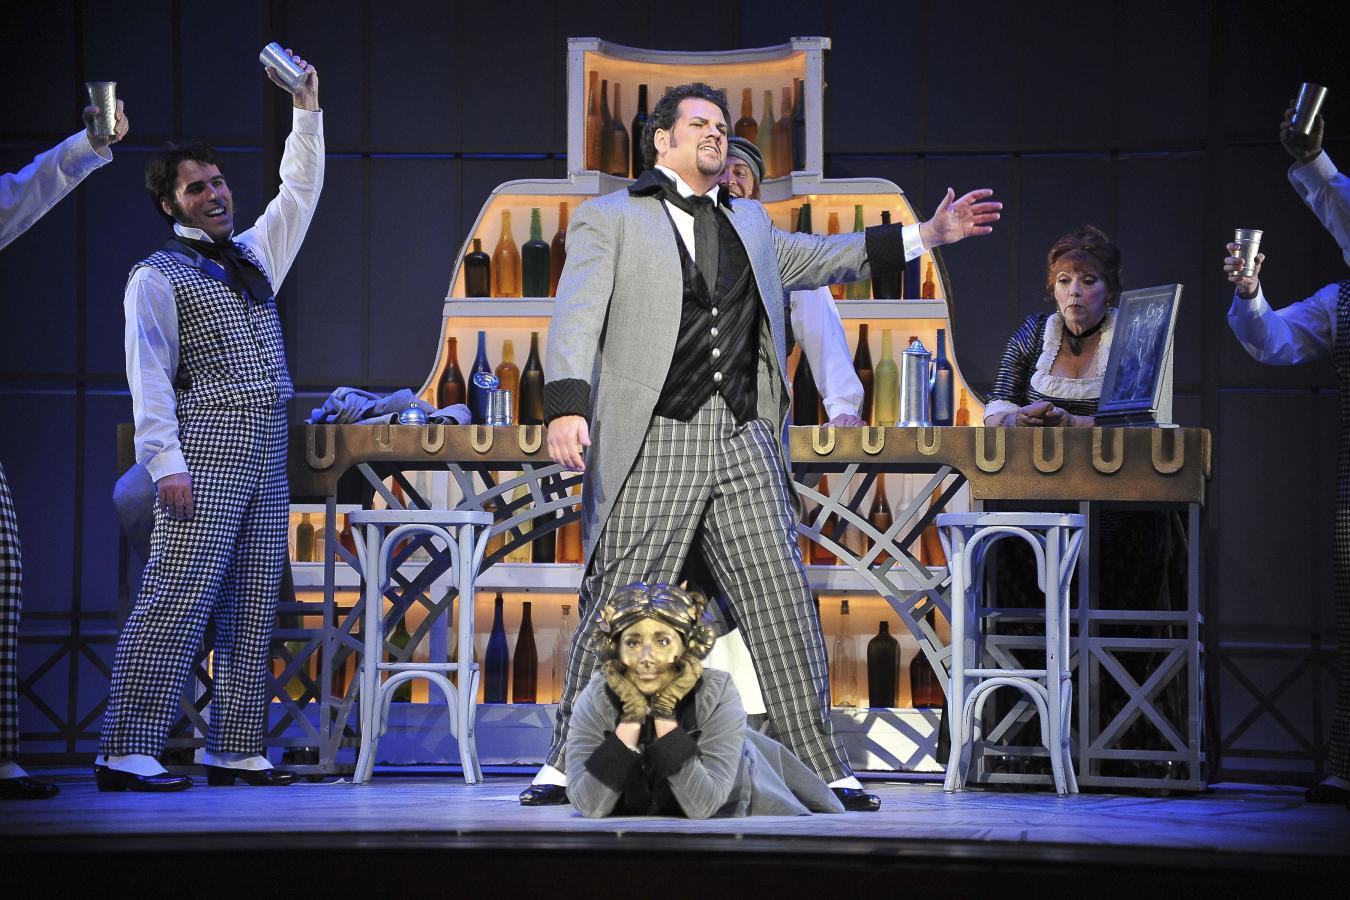 David Pomeroy and Katherine Rohrer in Florida Grand Opera's Hoffmann 2011